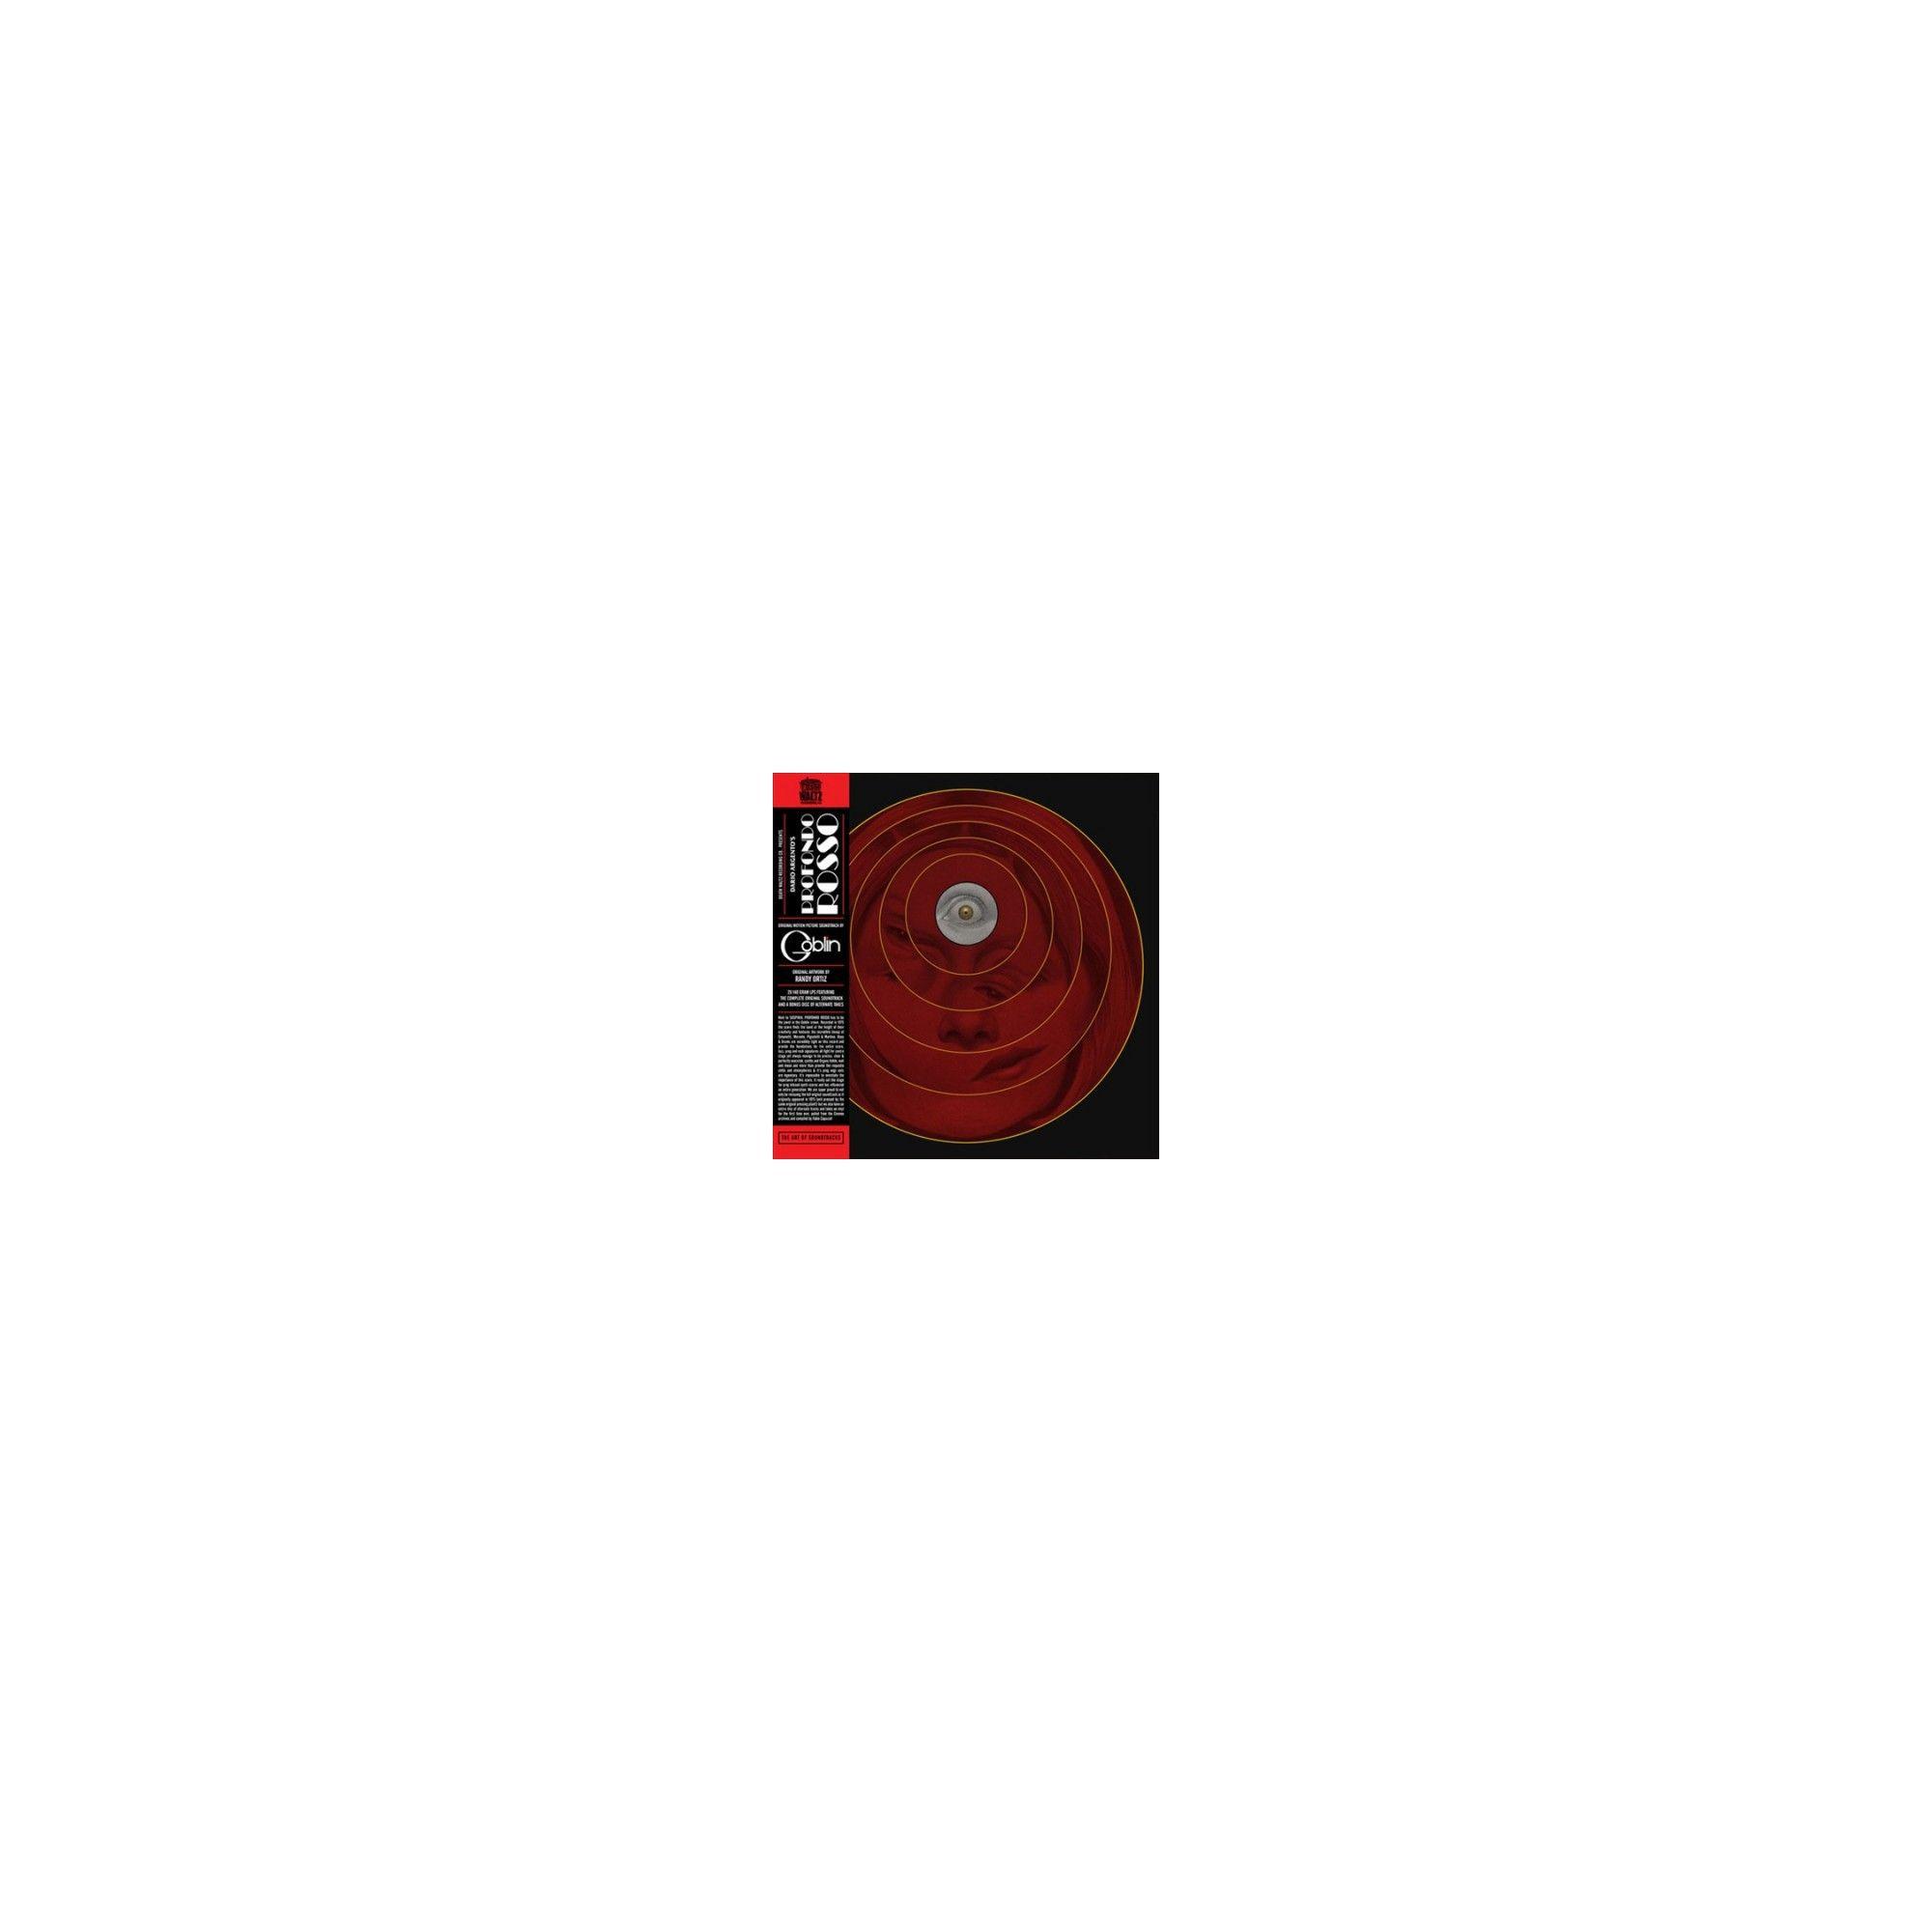 Goblin Profondo Rosso Ost Vinyl Vinyl Goblin Ost